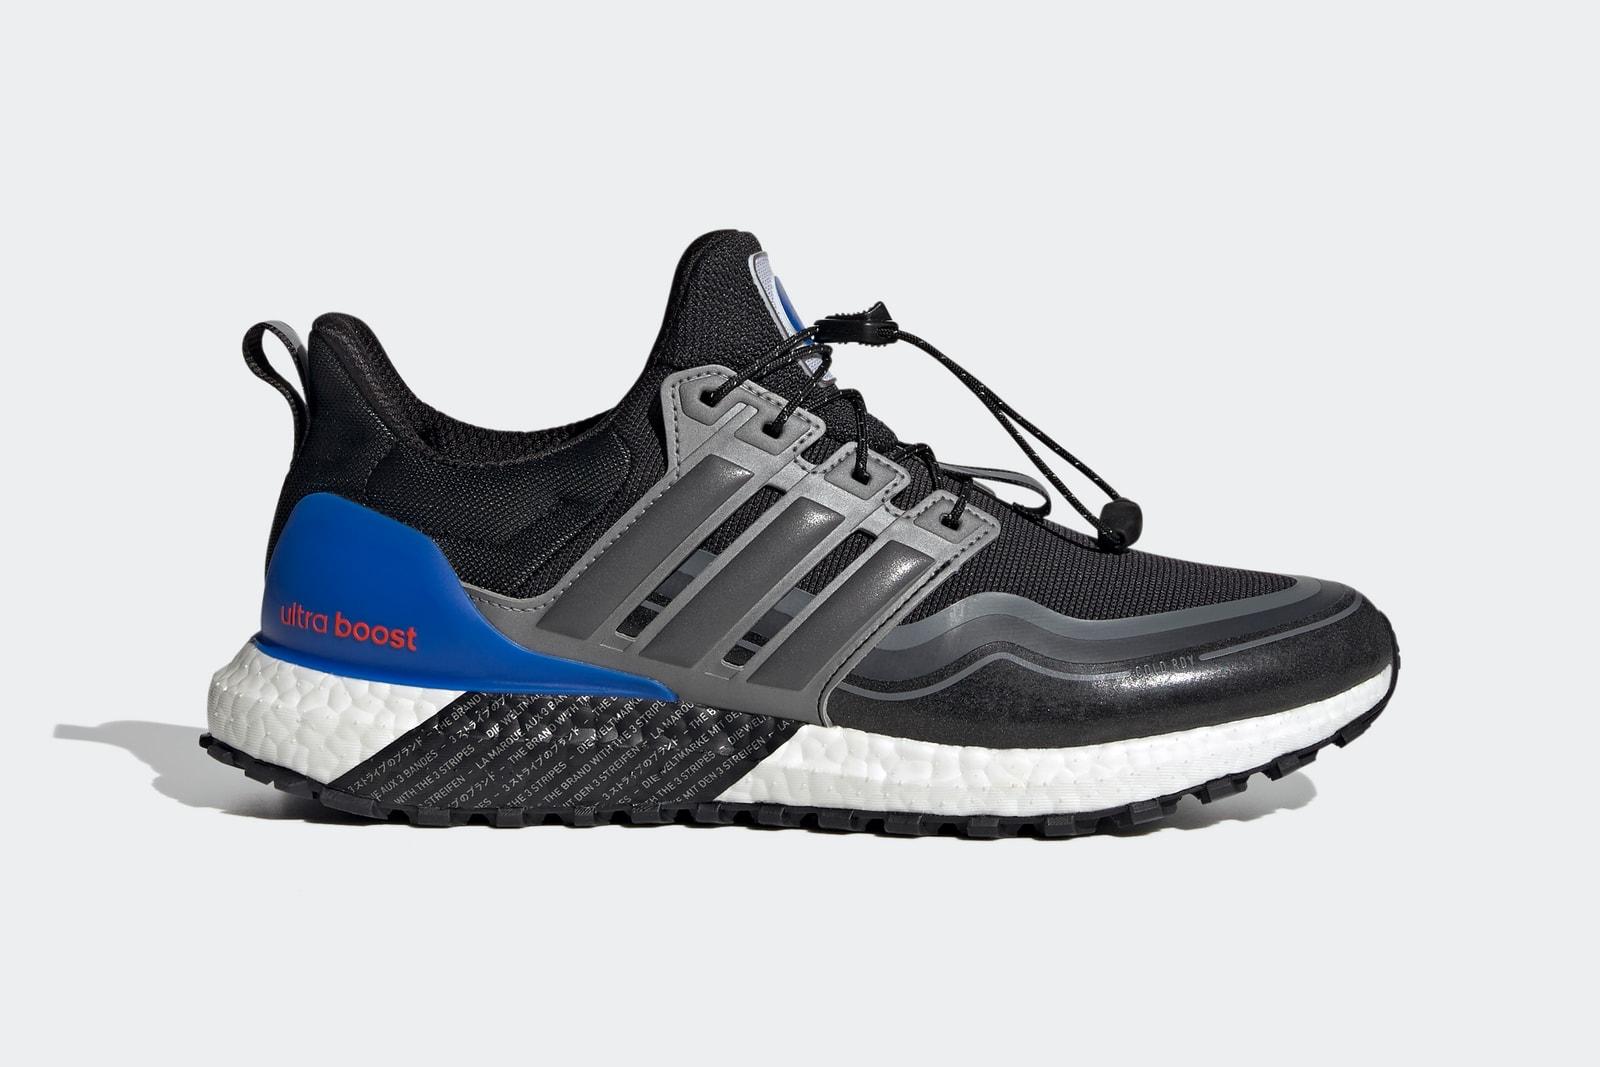 adidas 携手 NASA 打造 ULTRABOOST 限定跑鞋系列